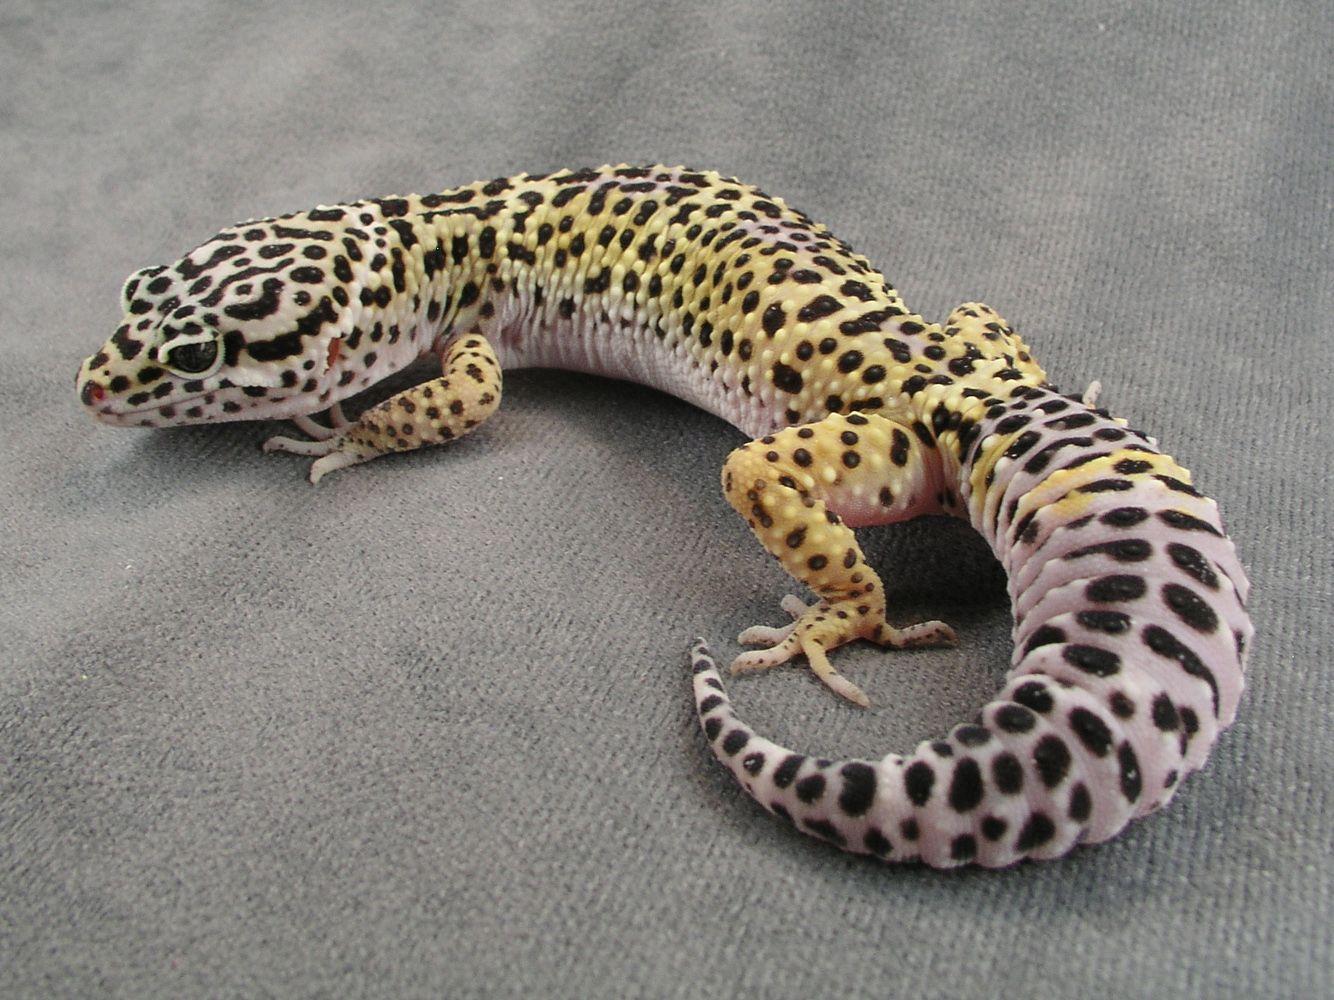 Leopard Gecko's Poop is Weird? (Again)?